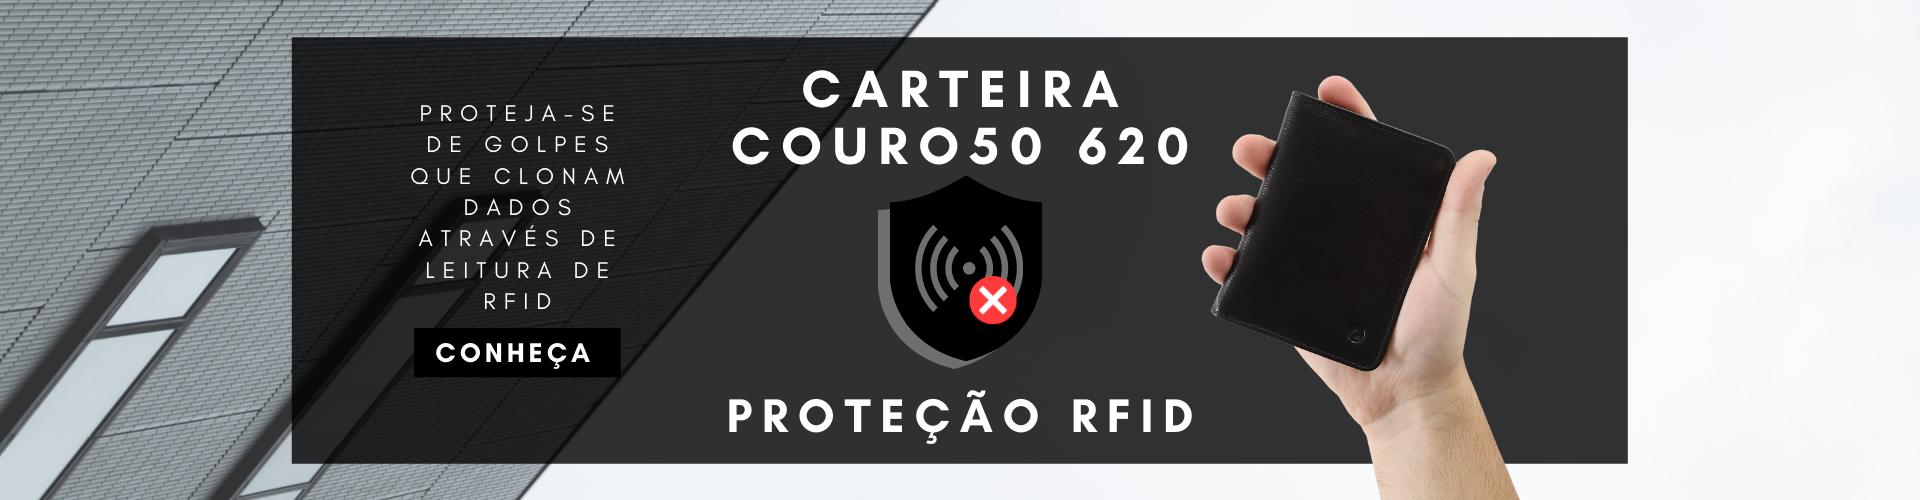 COURO50 MARI BOLSA TRANSVERSAL DIA DAS MÃES